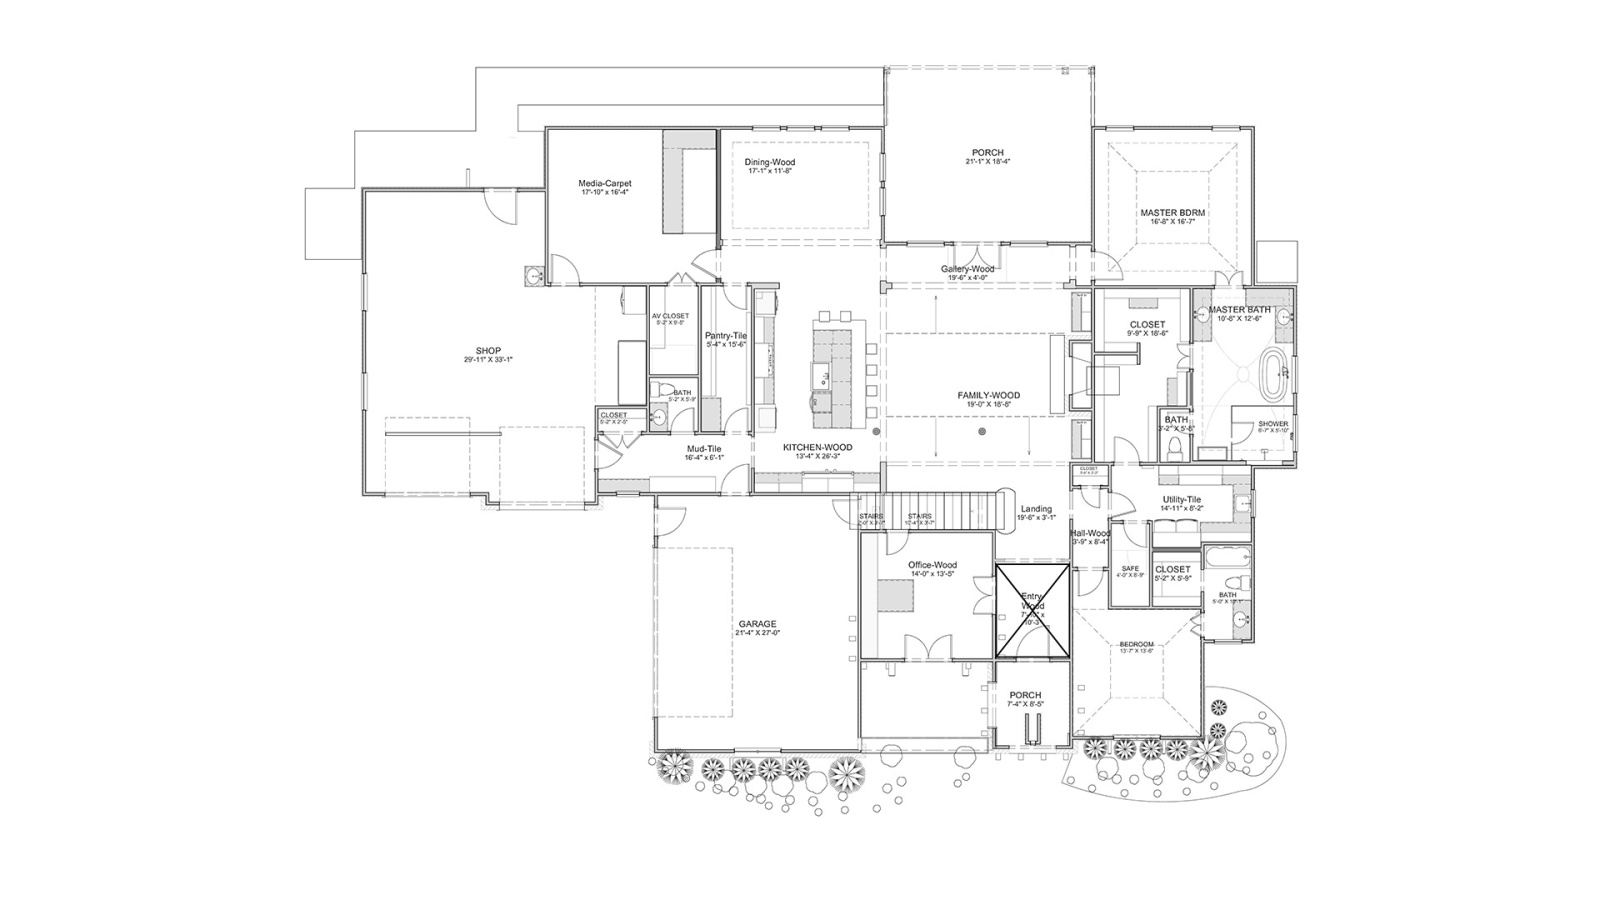 4 Bedrooms Bedrooms, ,5 BathroomsBathrooms,Custom Home,Home Plans,1021